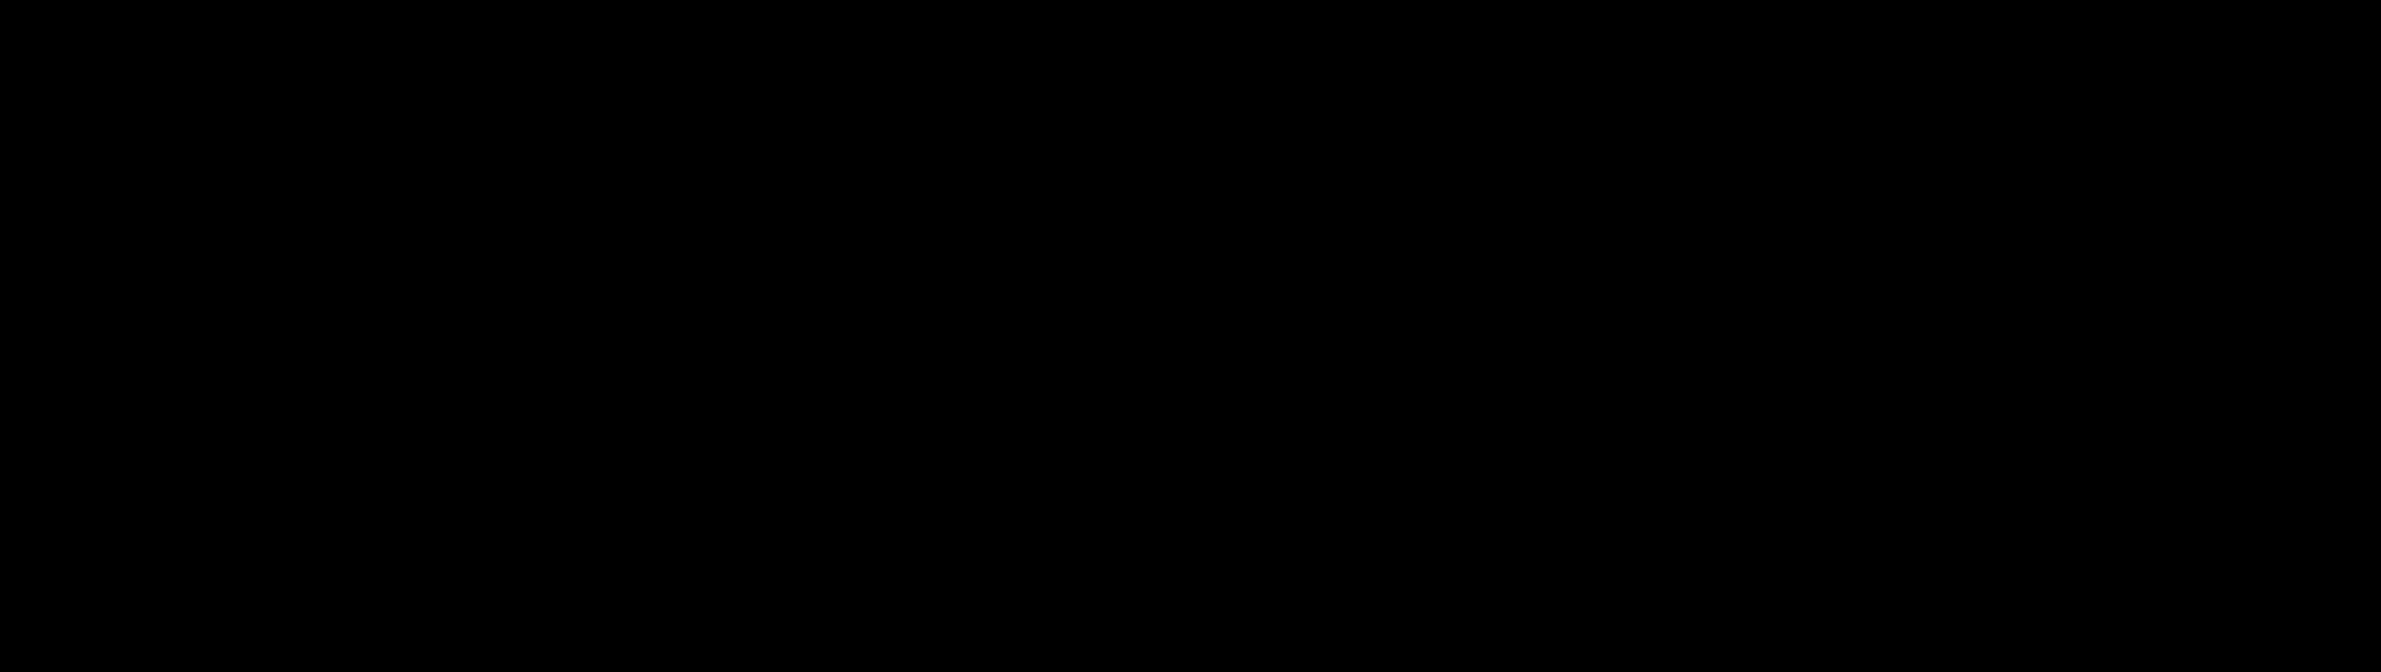 L-Thyroxine 4'-O-β-D-glucuronide